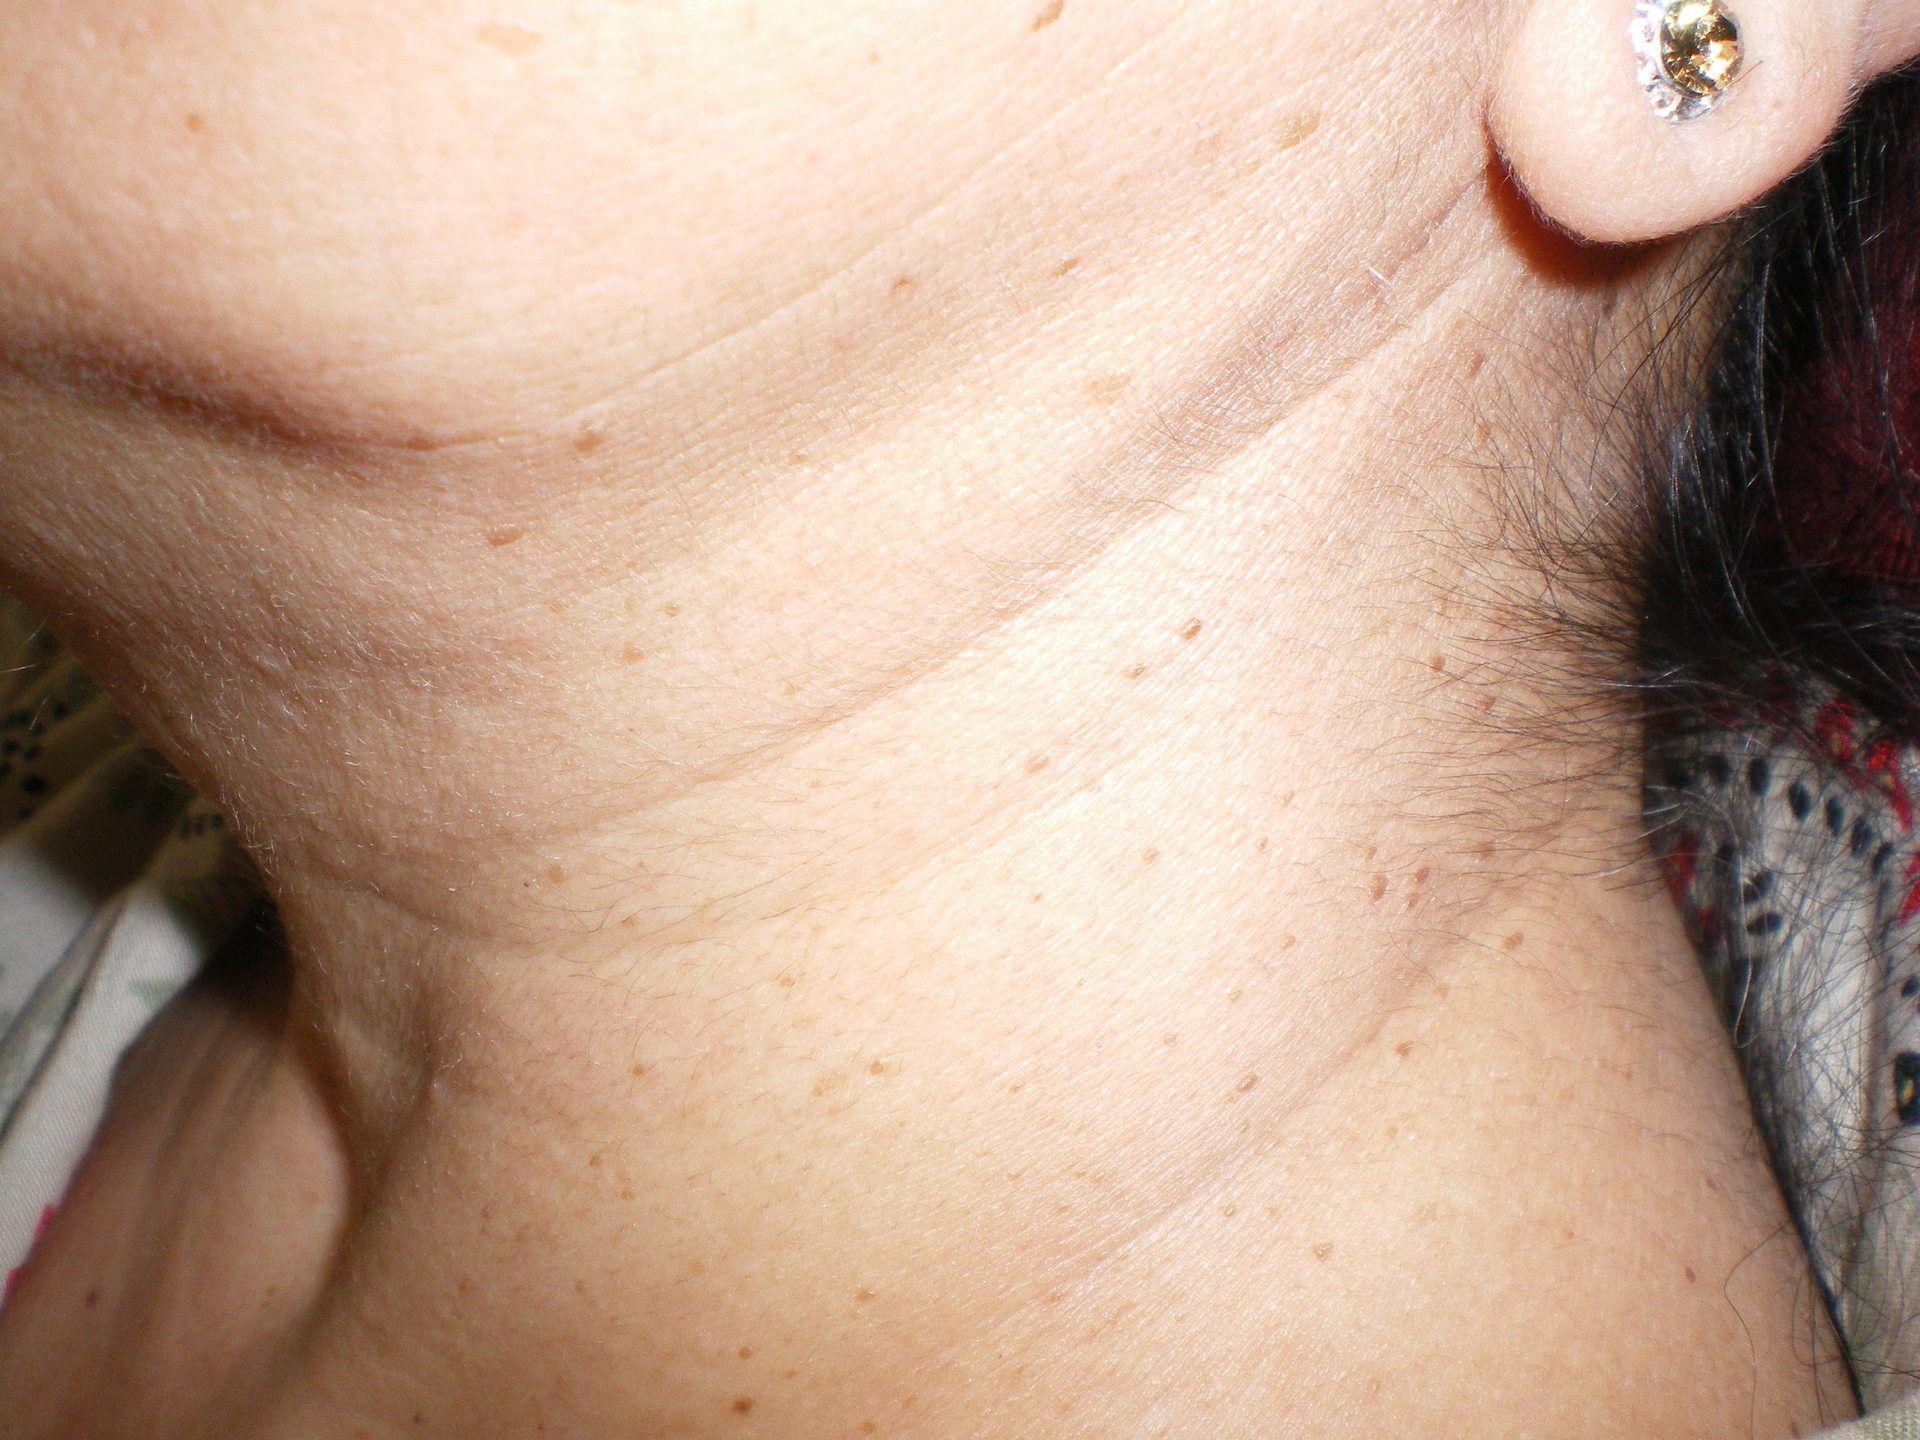 Skin tags needing removal